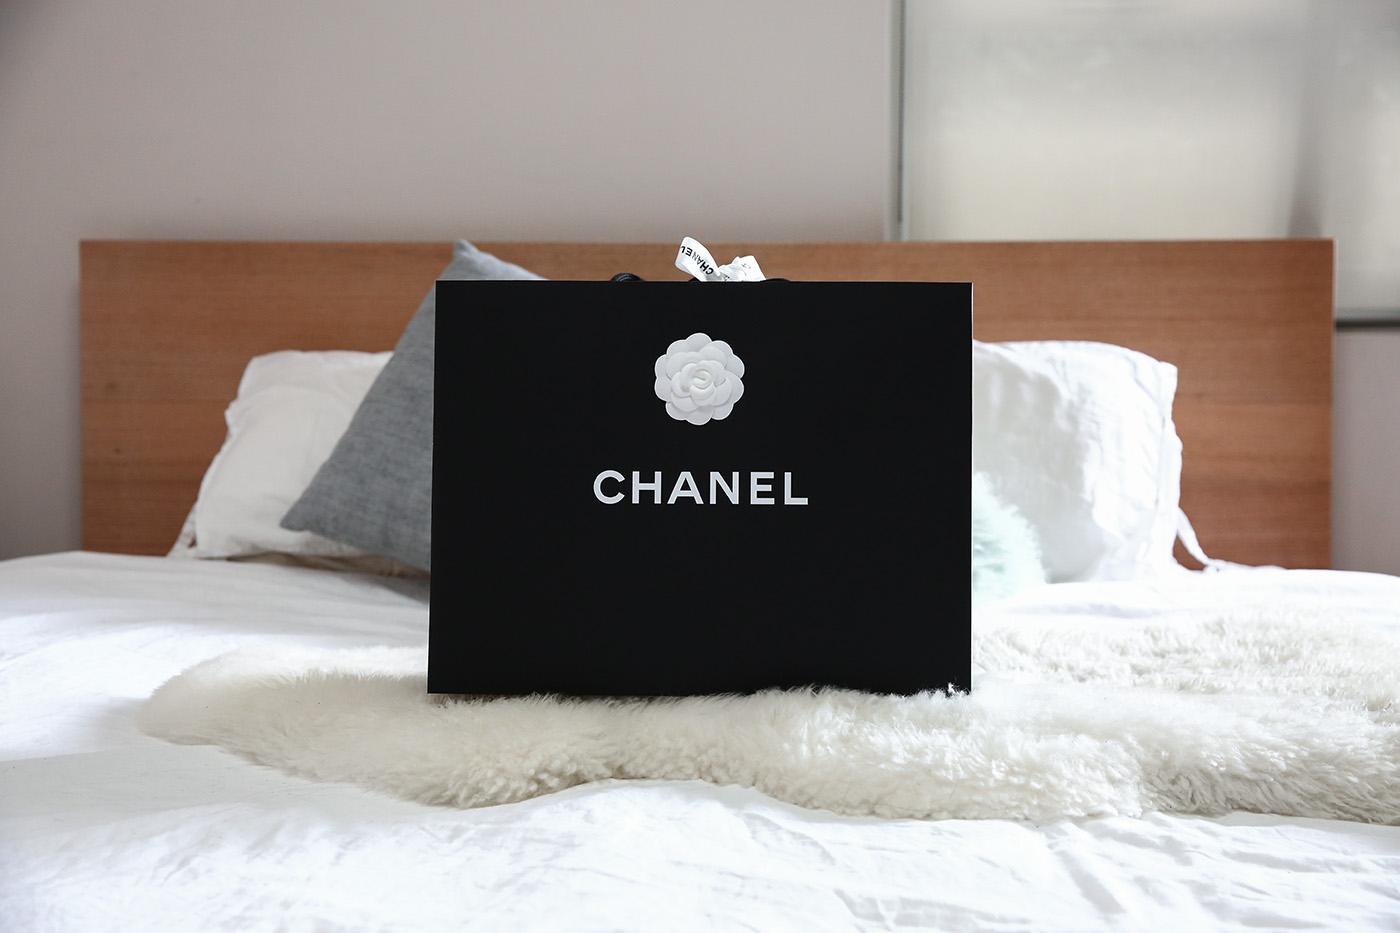 b9a7a32e My First Chanel Bag | Mademoiselle | A Minimalist Fashion Blog